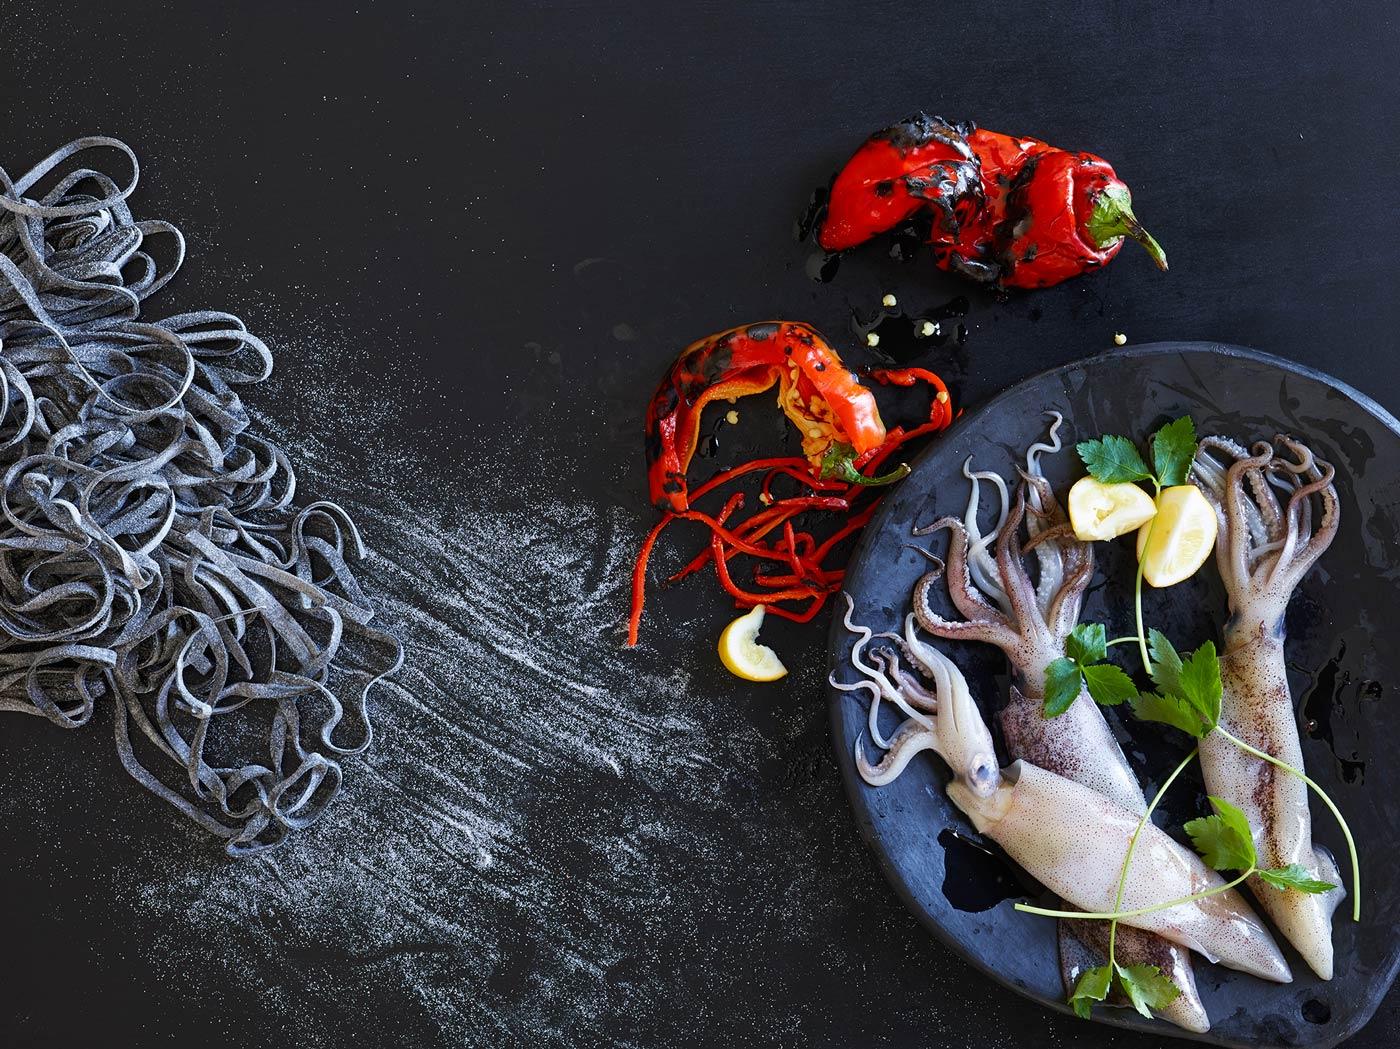 abreakey-raw-foodphotography-squid-still-life